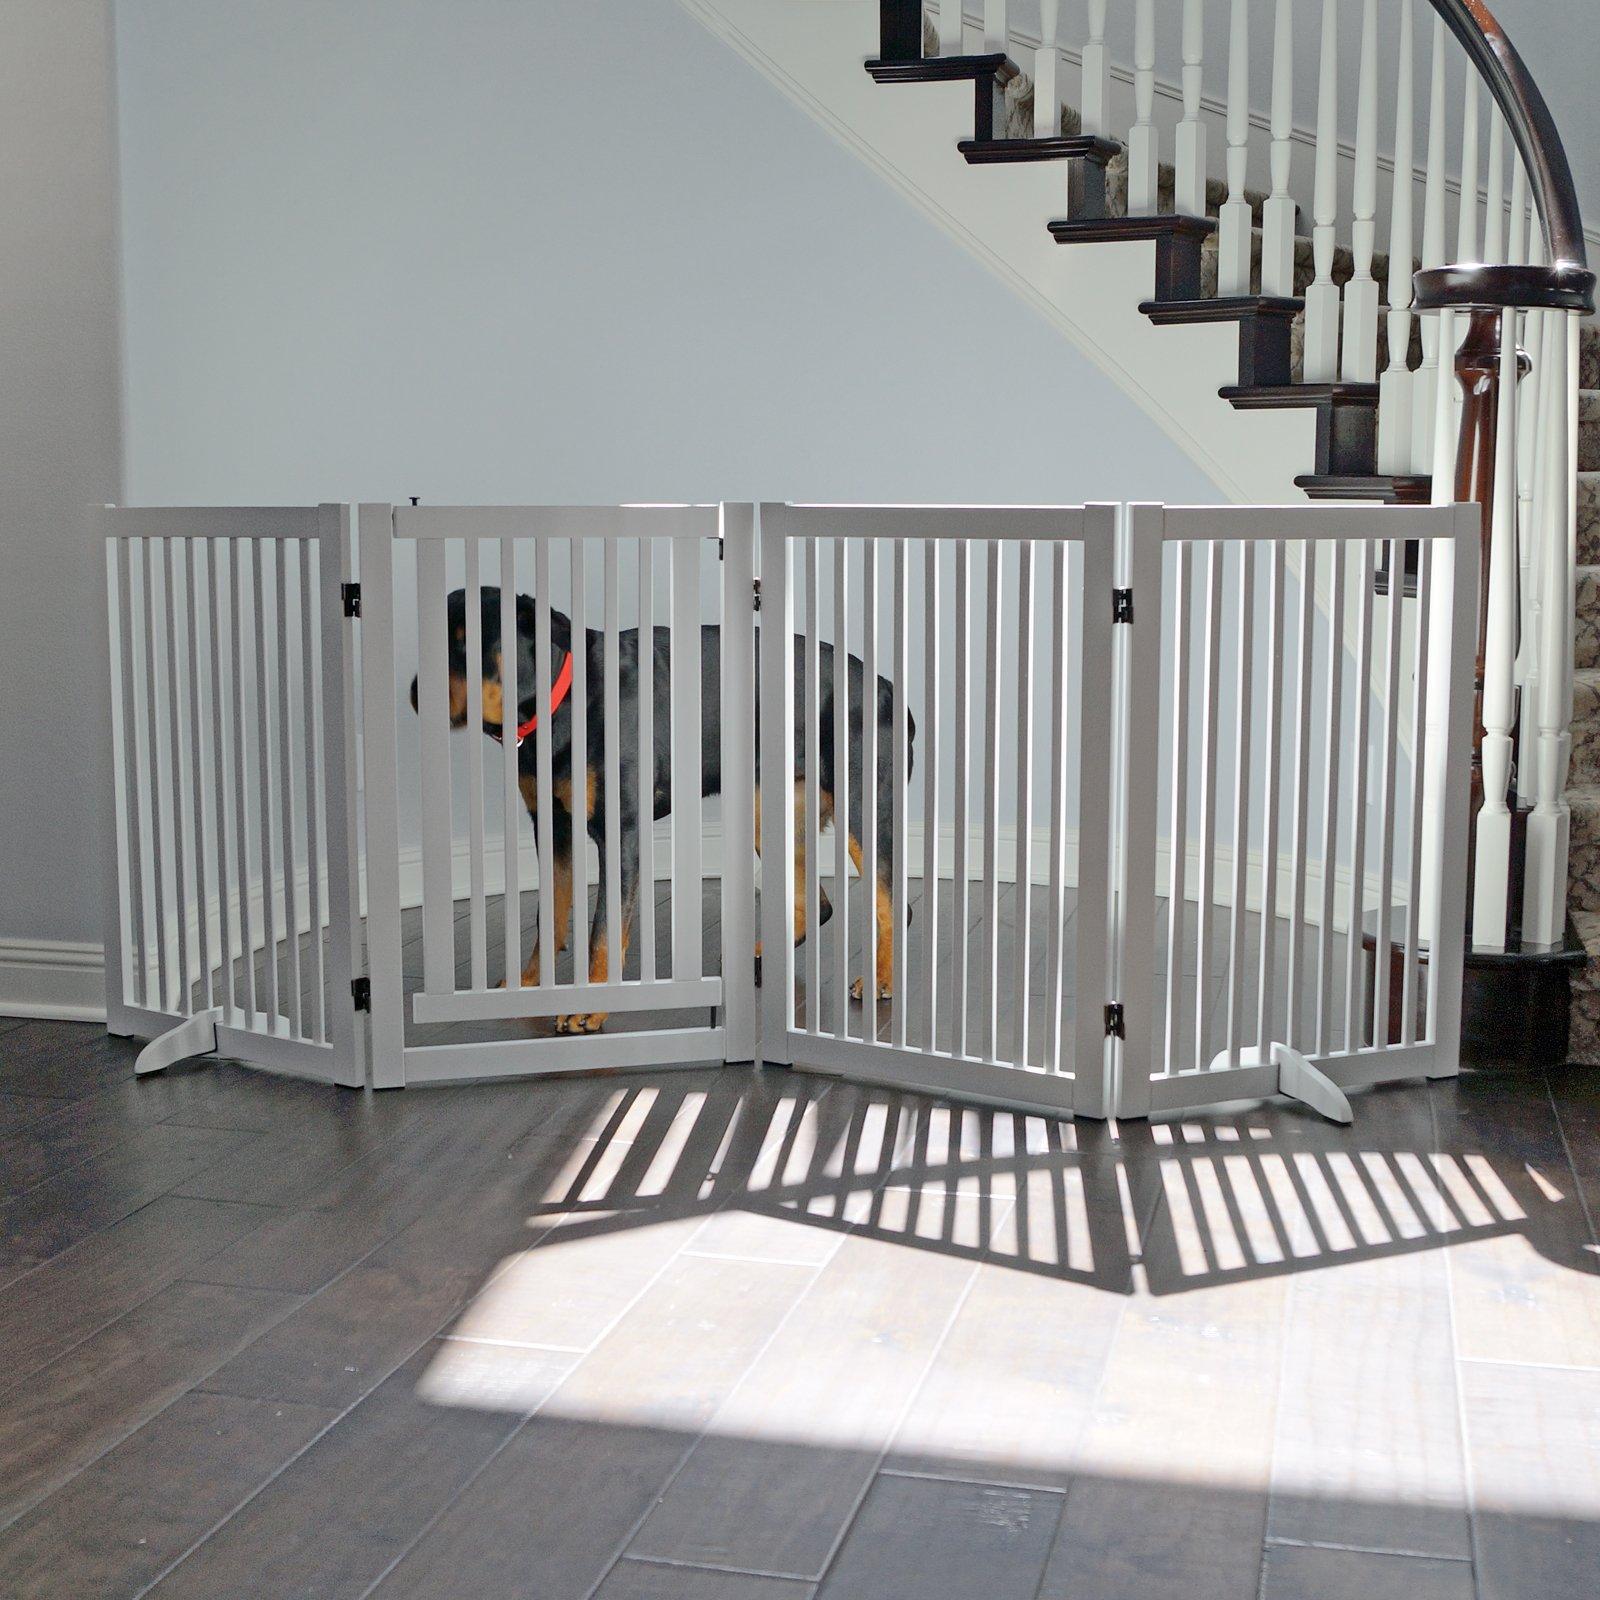 WELLAND Freestanding Wood Pet Gate w/ Walk Through Door, 88-Inch, White by WELLAND (Image #7)